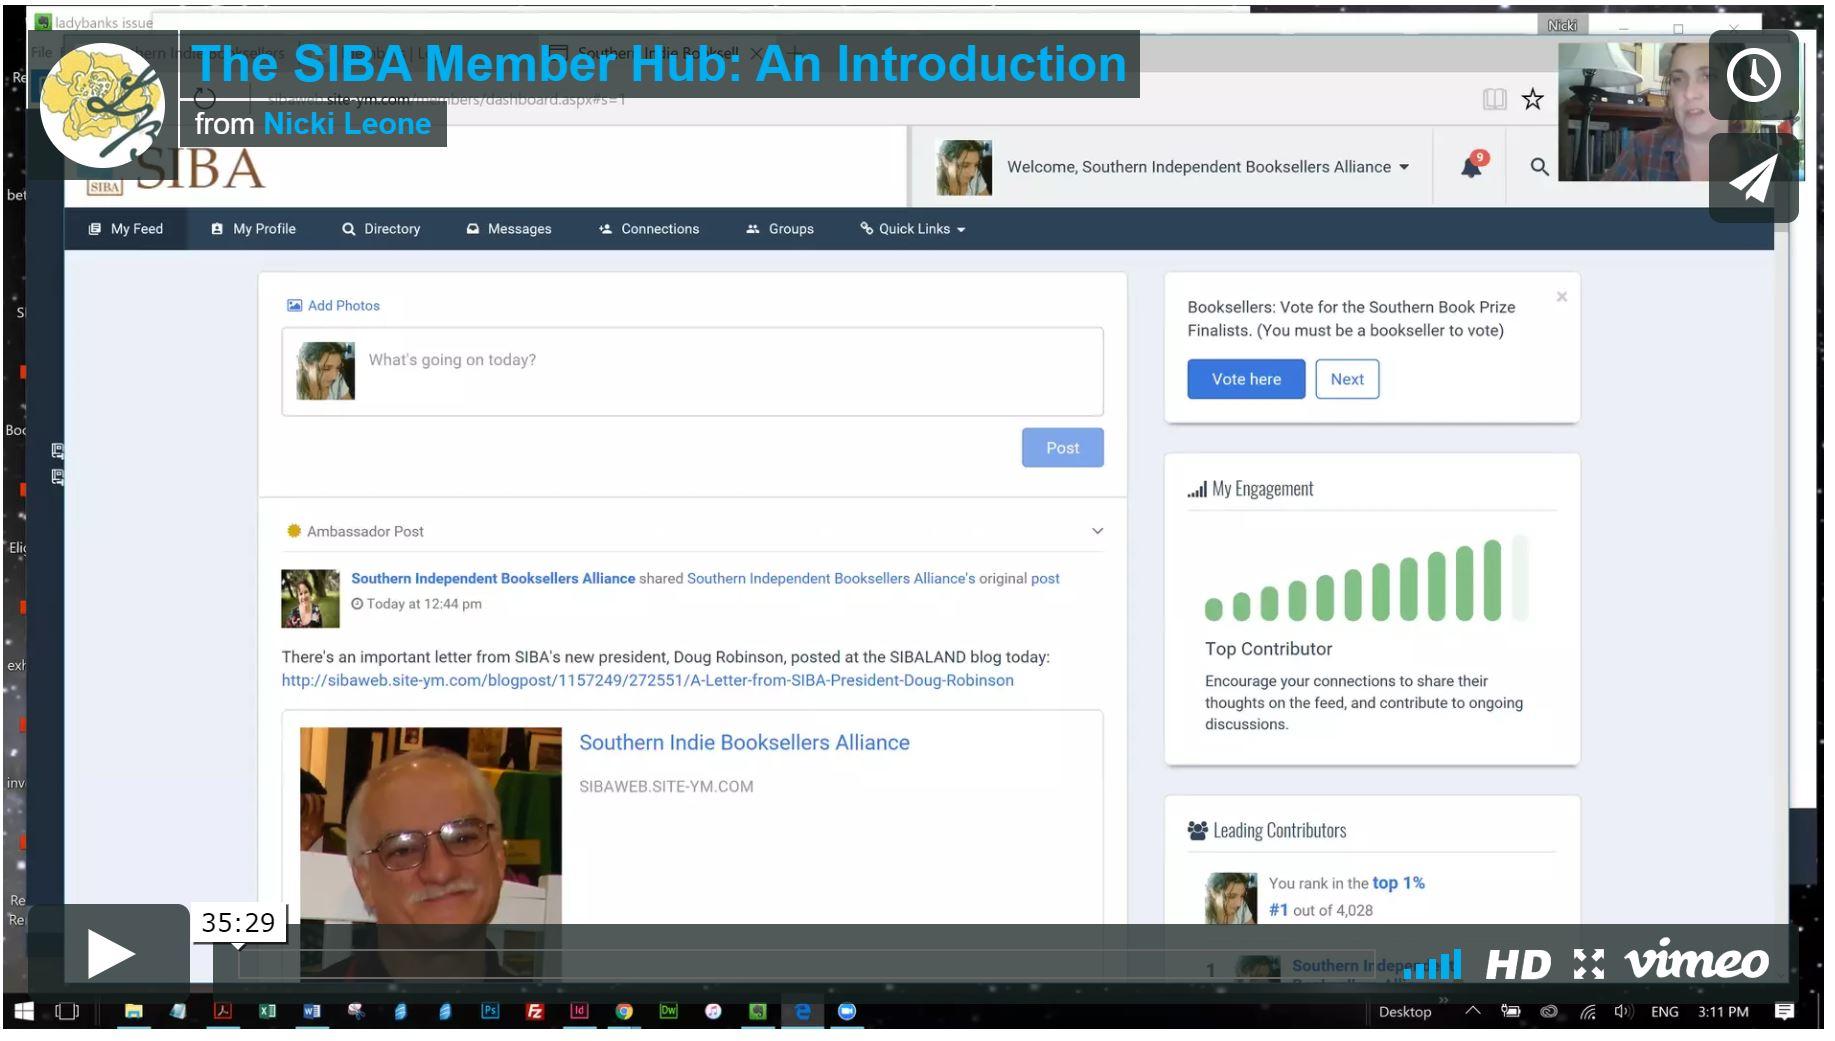 SIBA Member Hub Videos